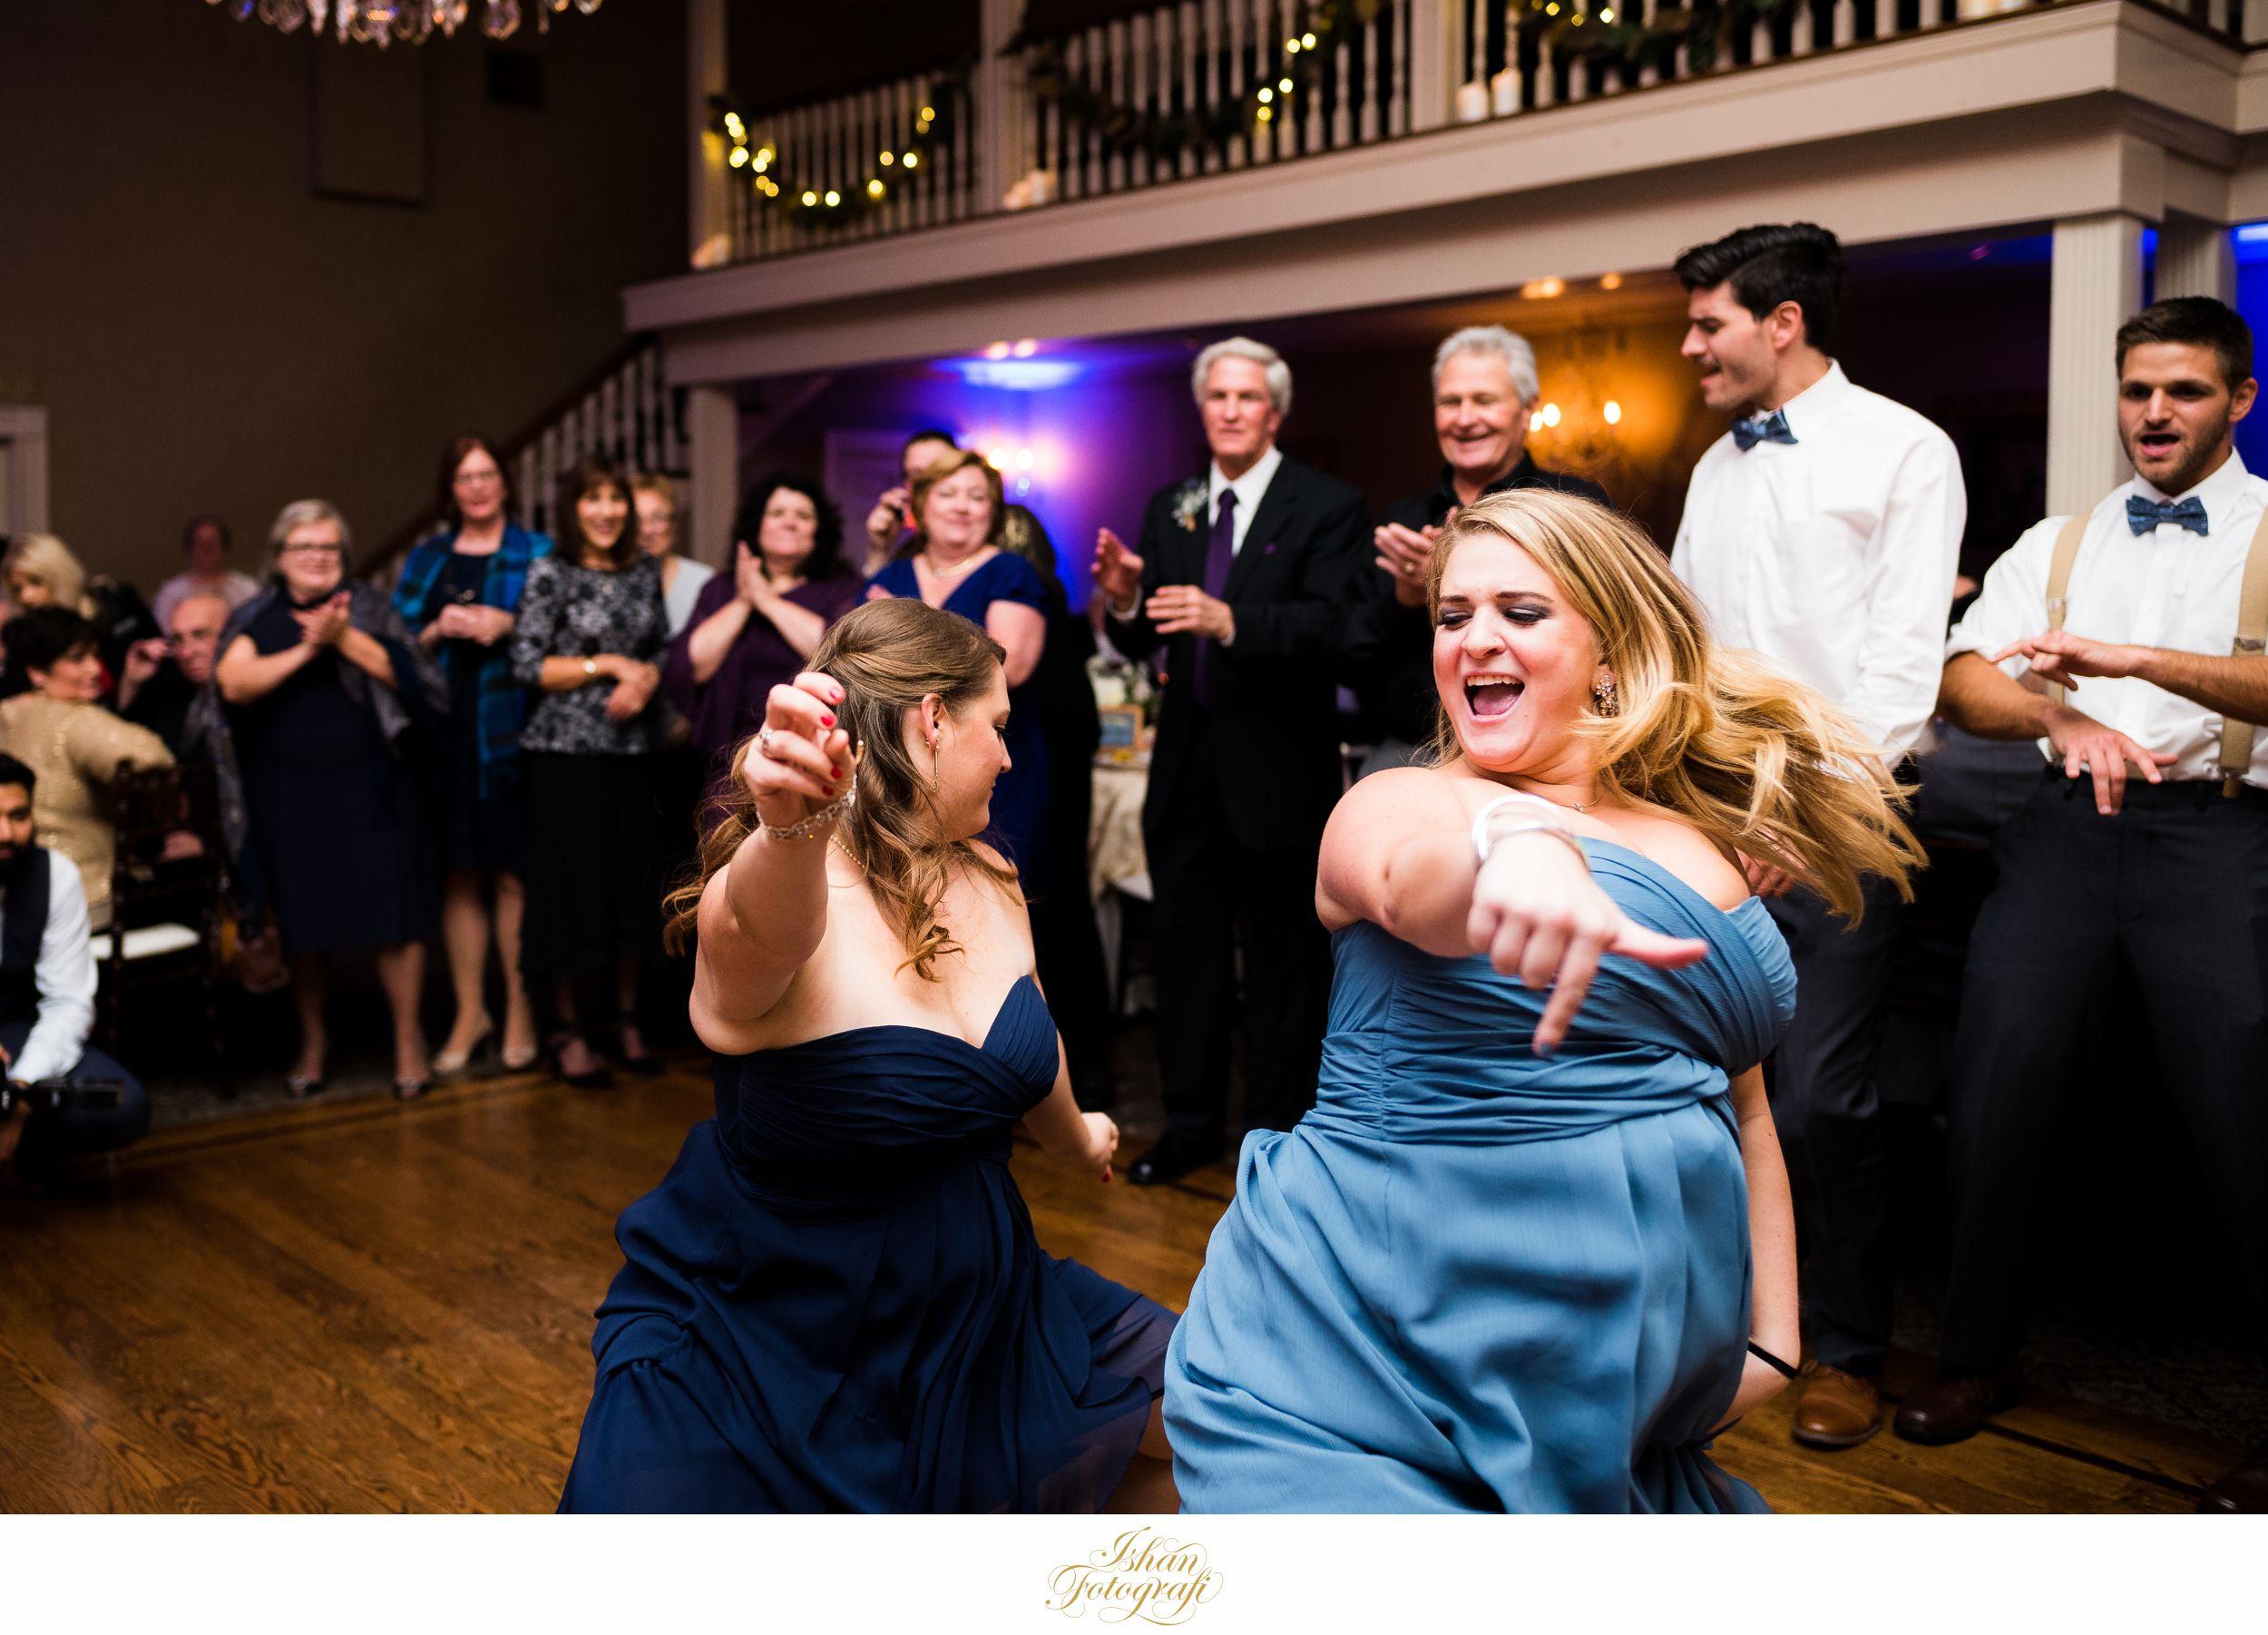 davids-country-inn-hackettstown-wedding-photo